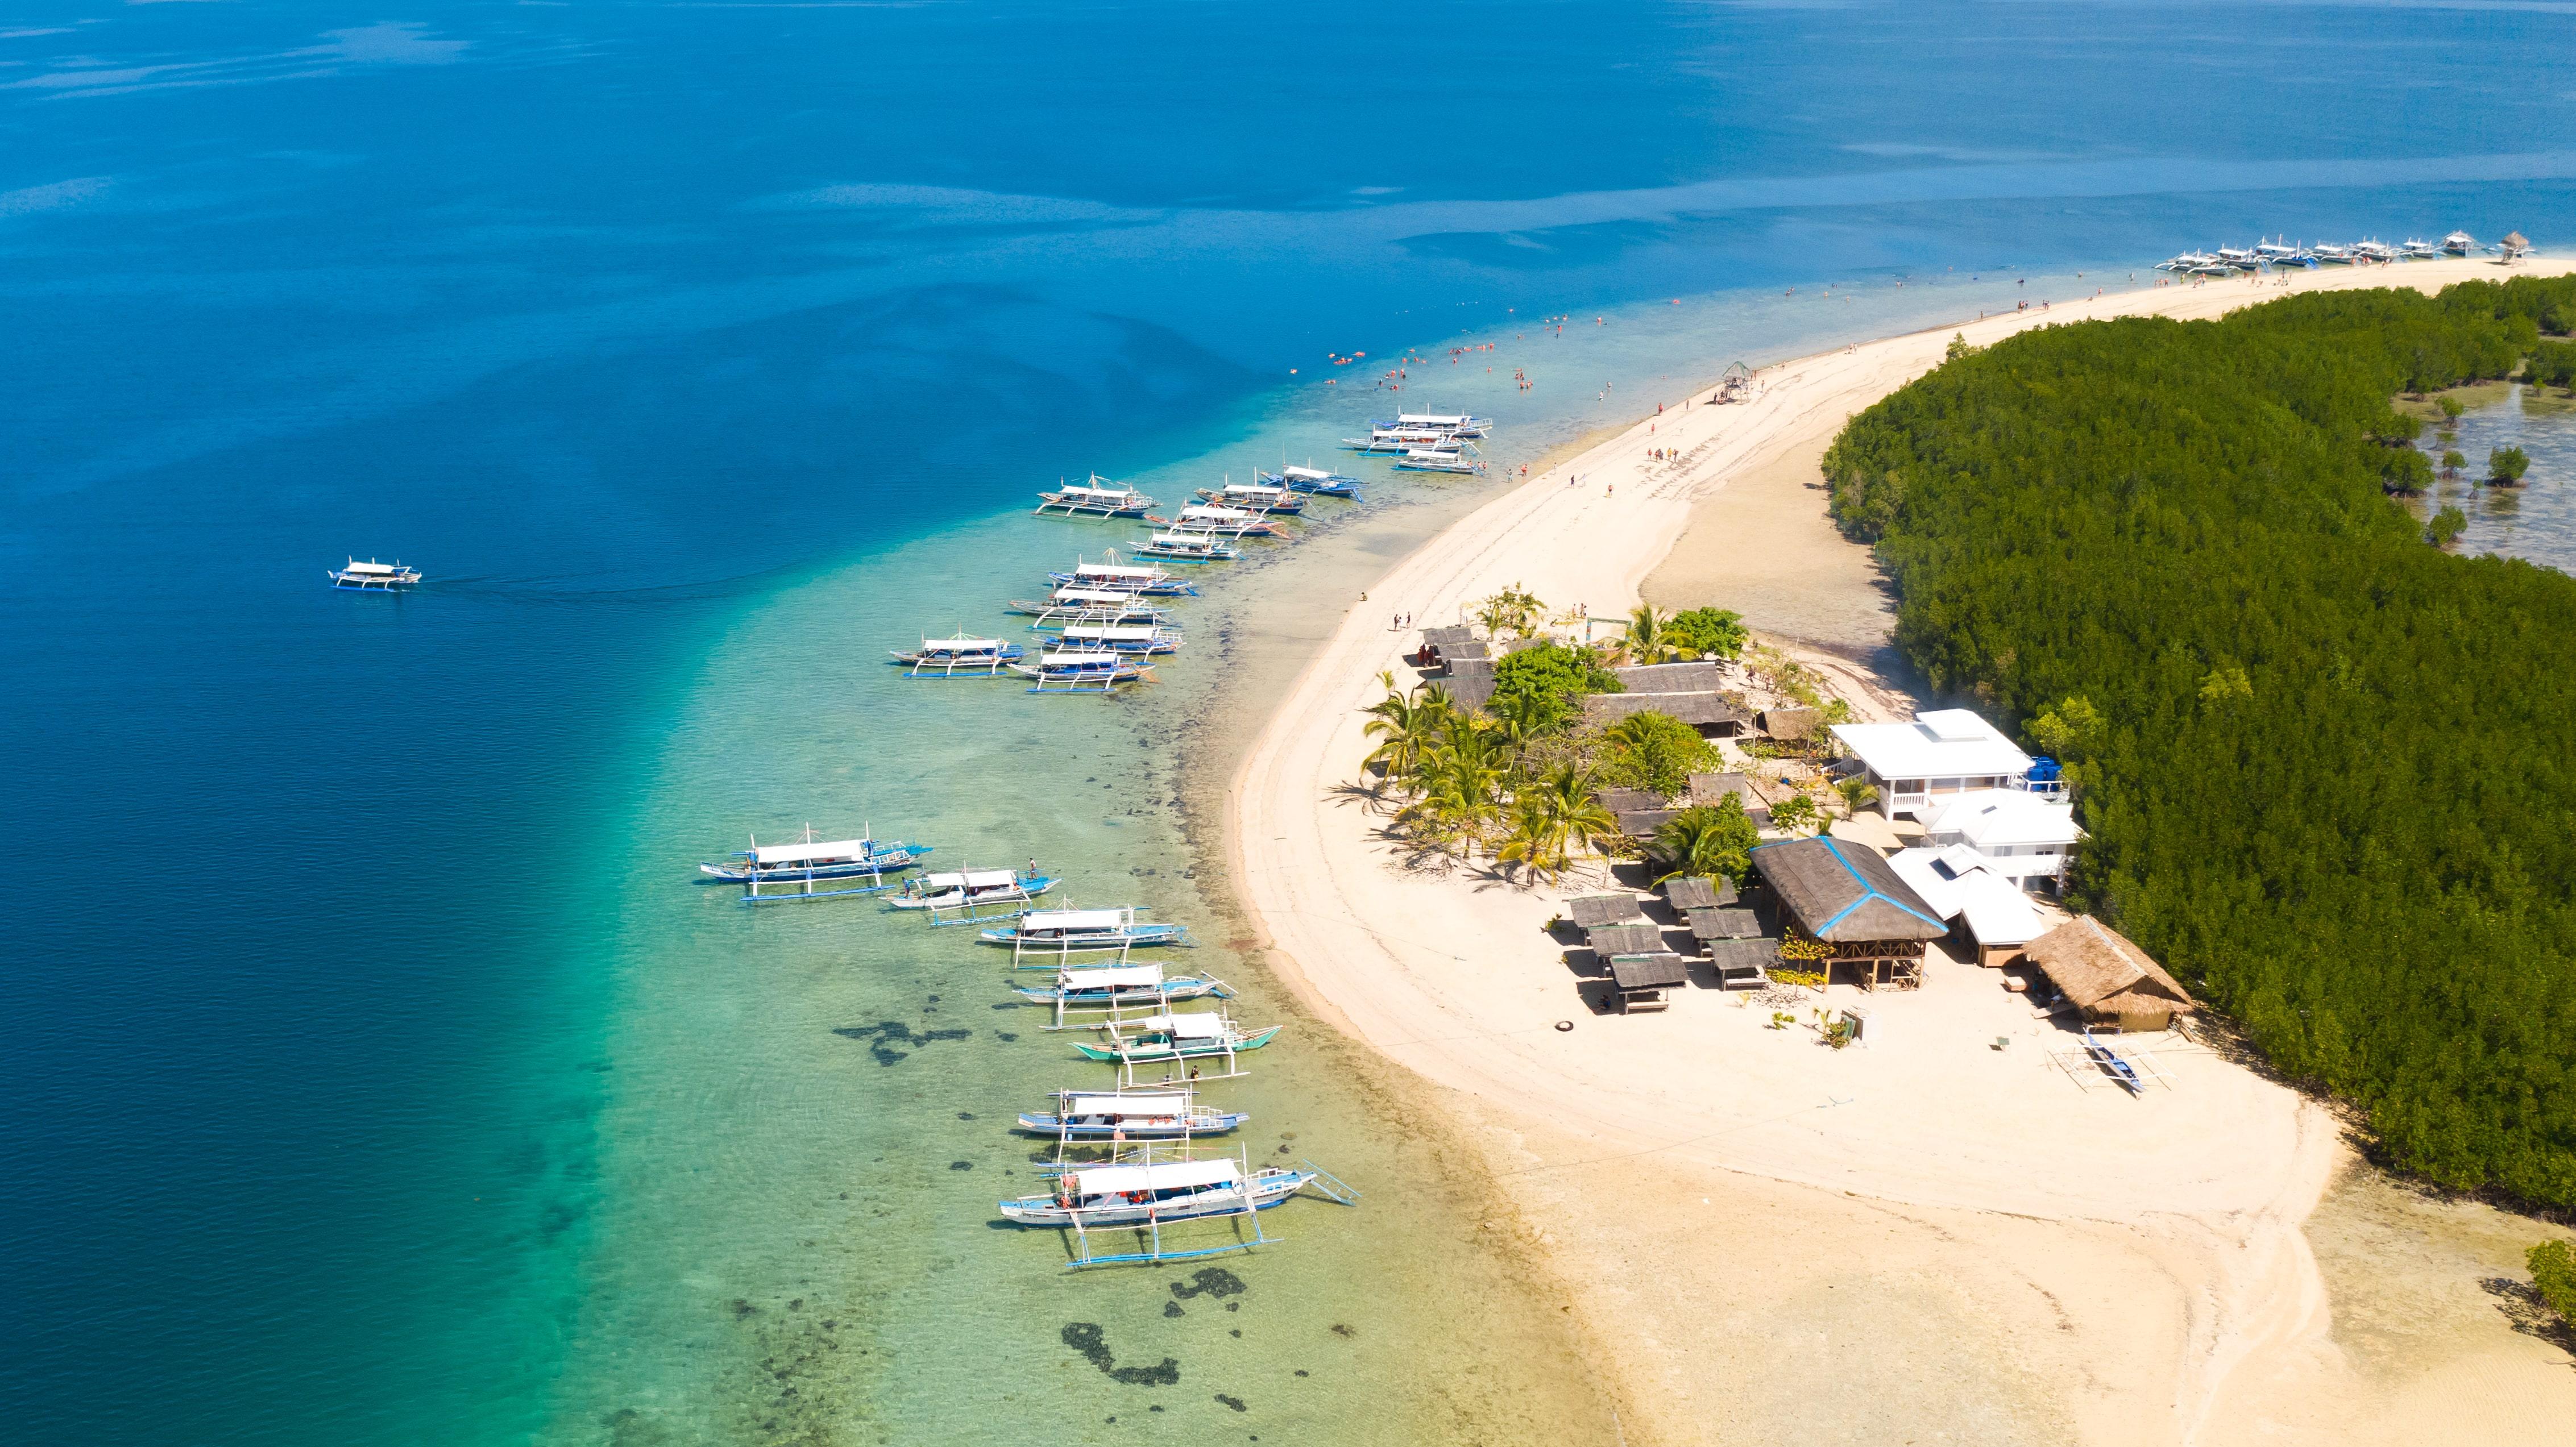 Boats docked on the beach of Starfish Island